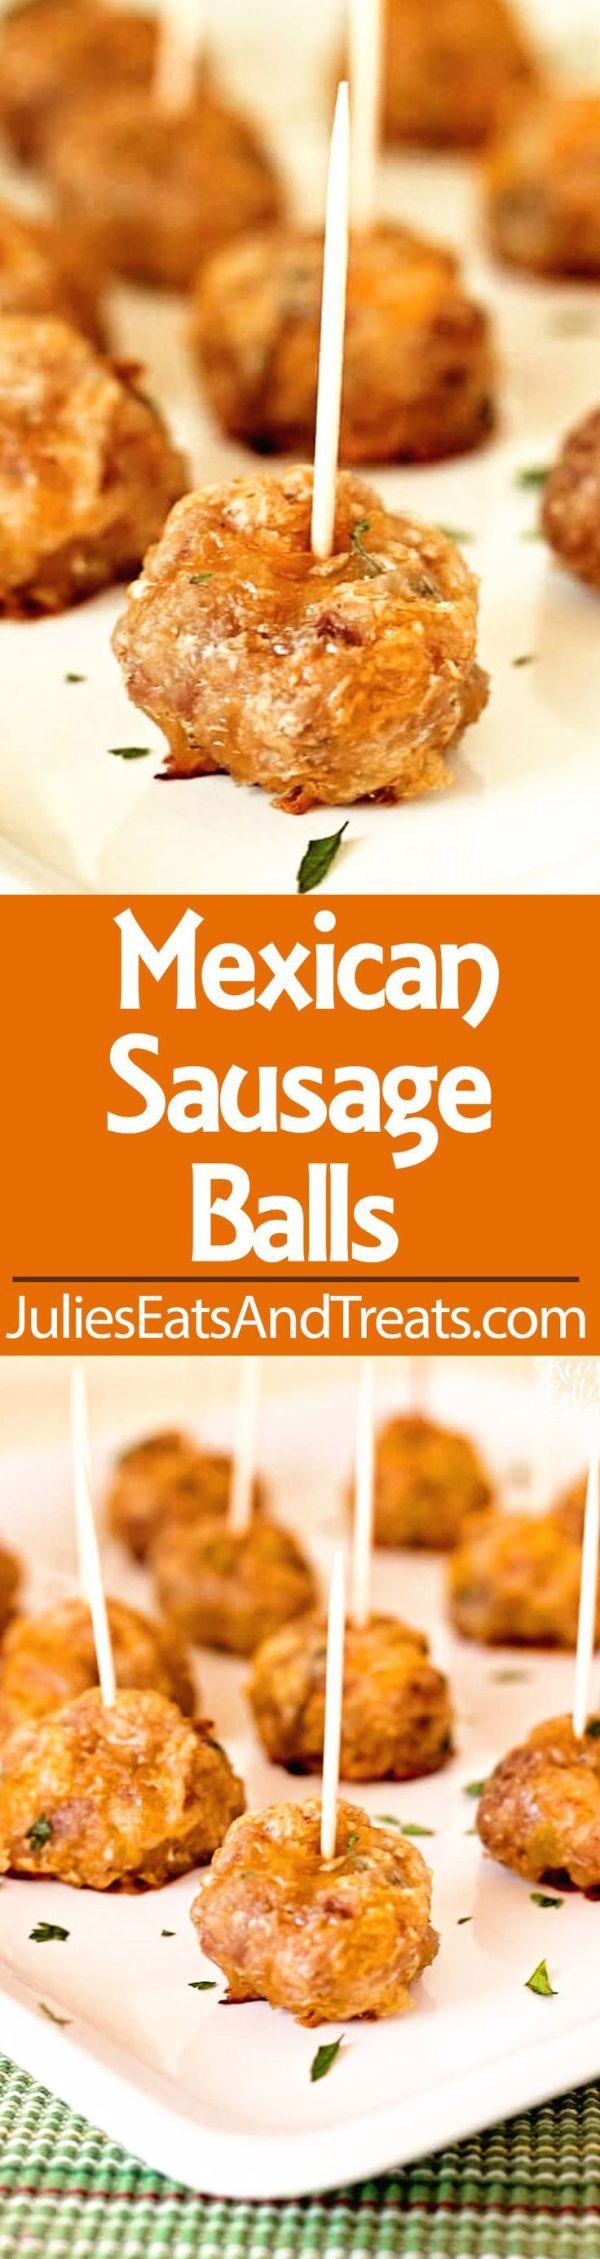 17 Best ideas about Sausage Balls on Pinterest   Party ...